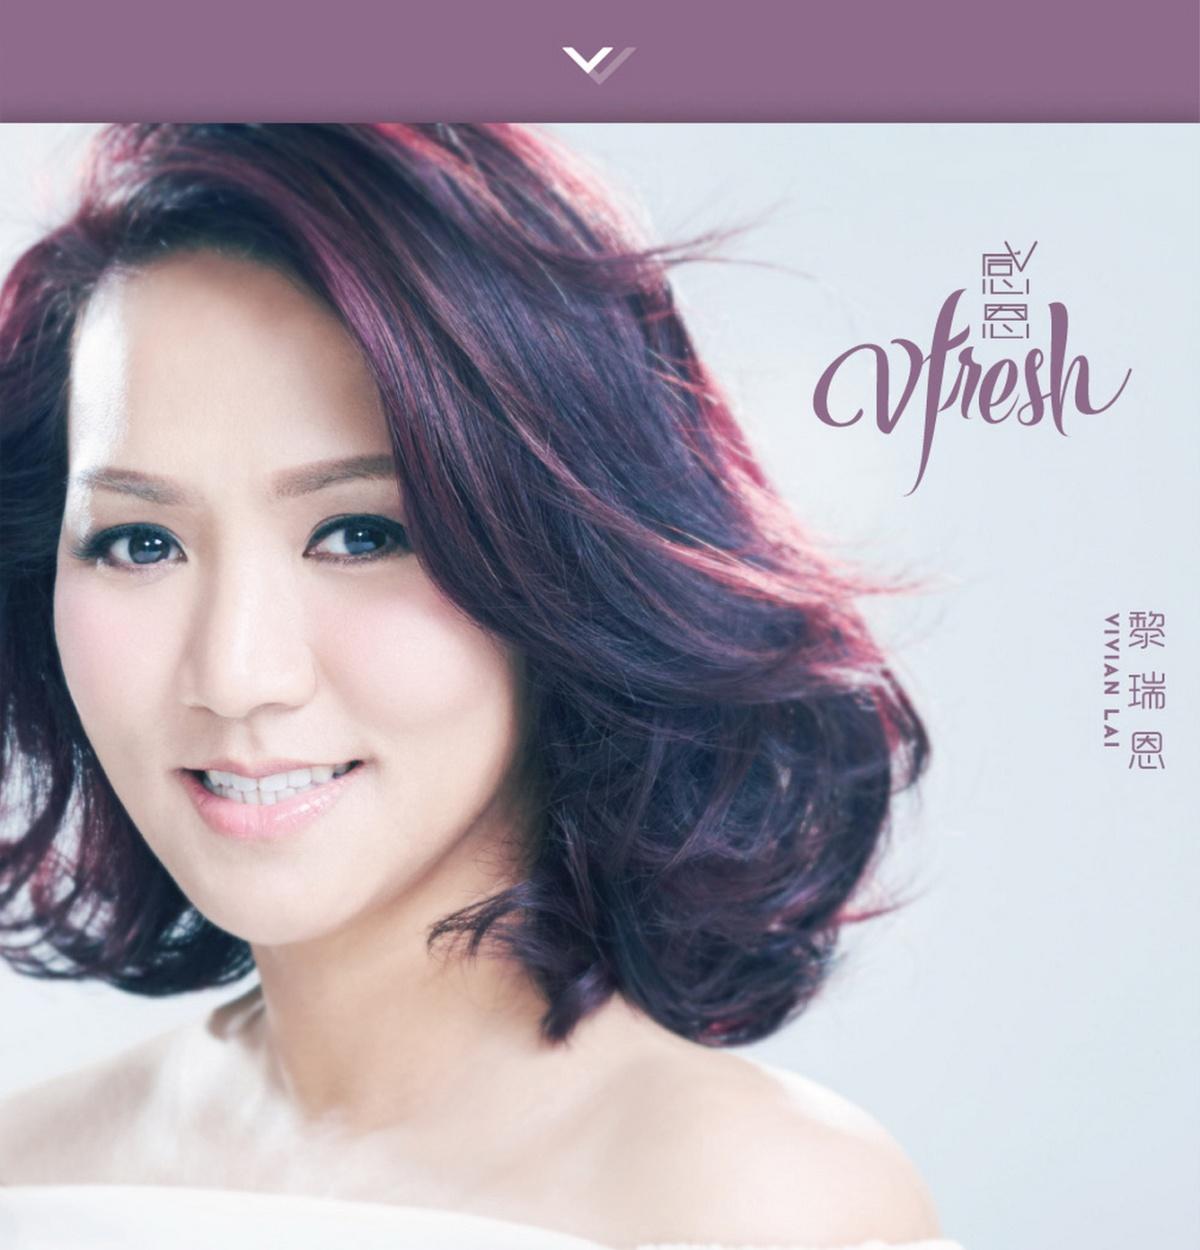 Vivian Lai - Vfresh - iHonHon